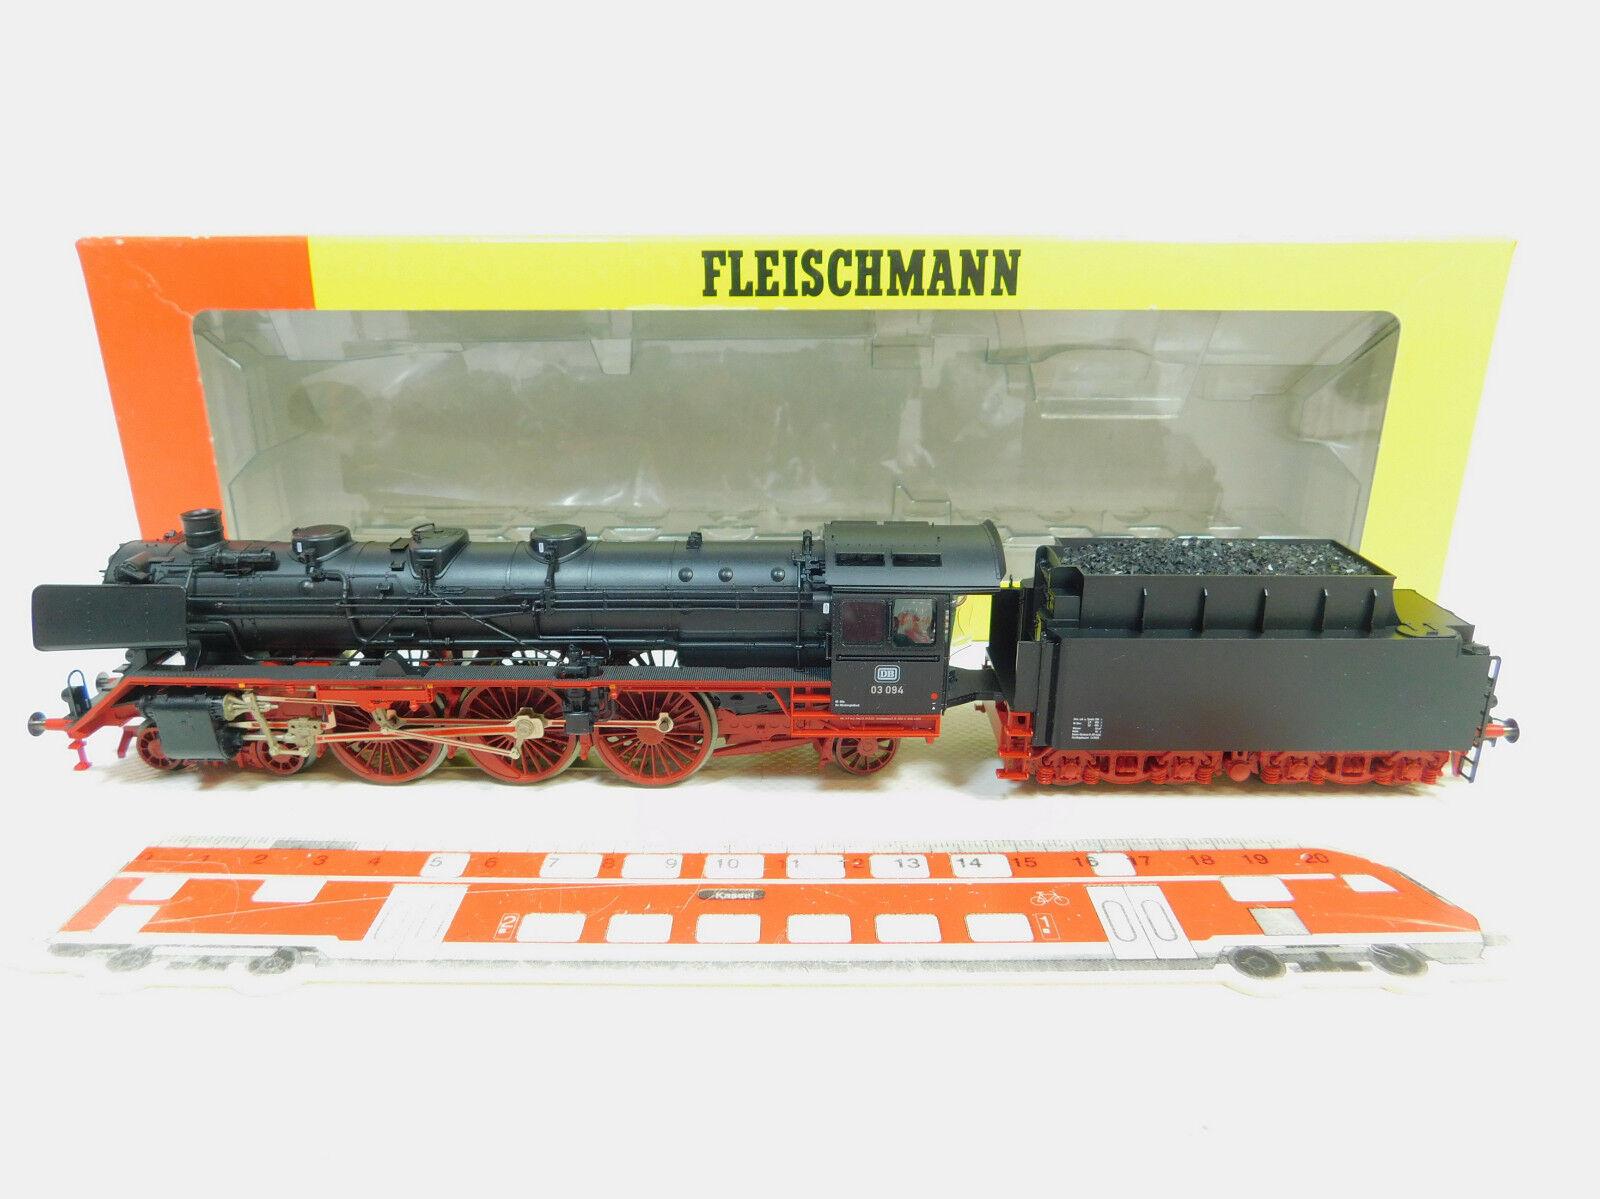 Bo186-2  Fleischmann h0/ac 1103 K locomotiva 03 094 DB NEM SOUND ESU-digitale, OVP